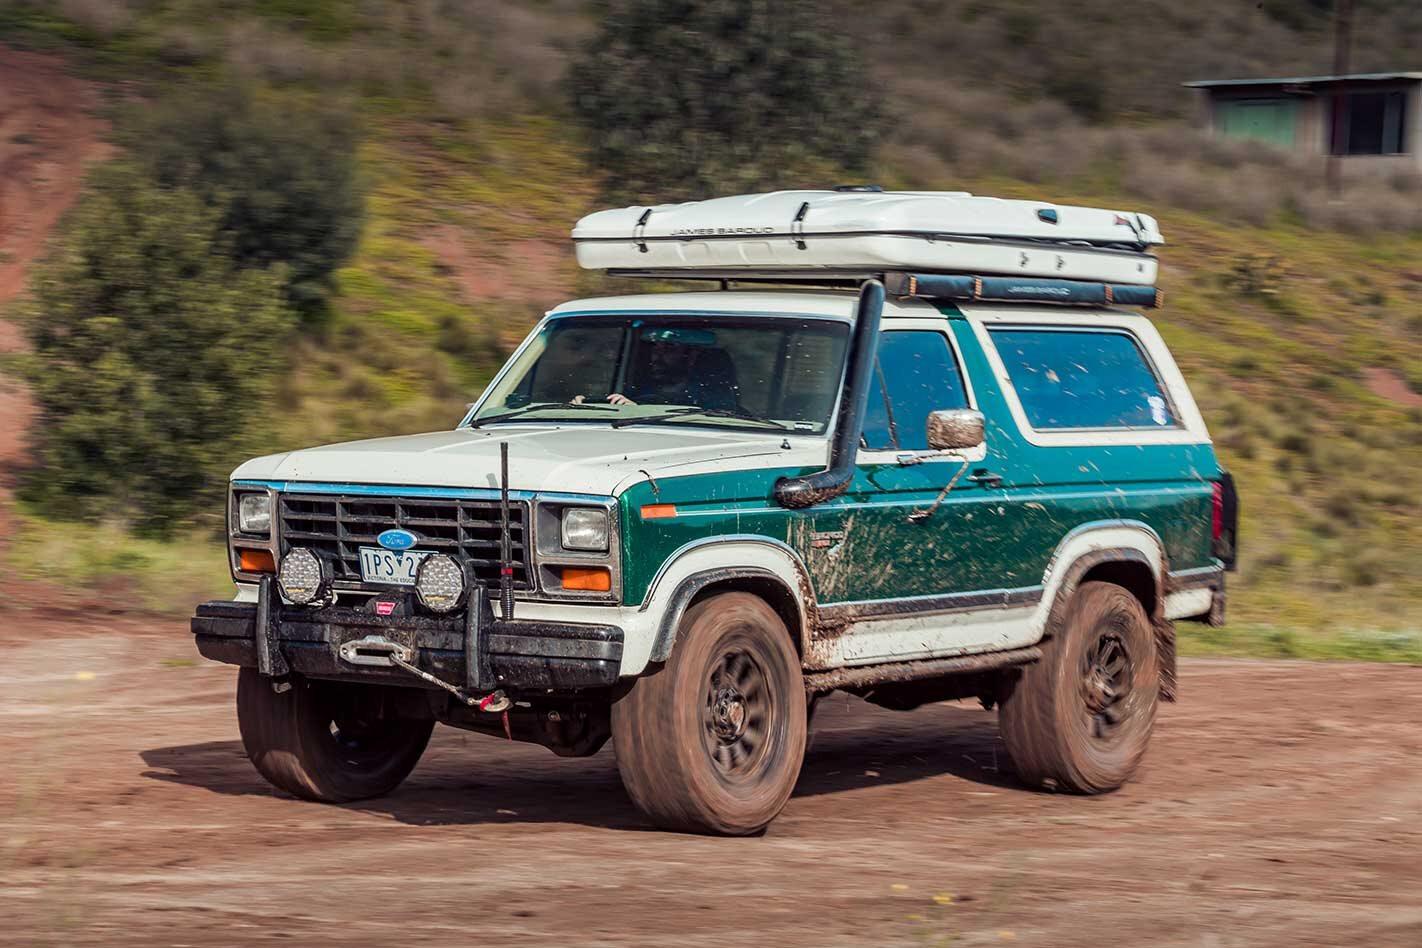 V8-powered Ford Bronco XLT build